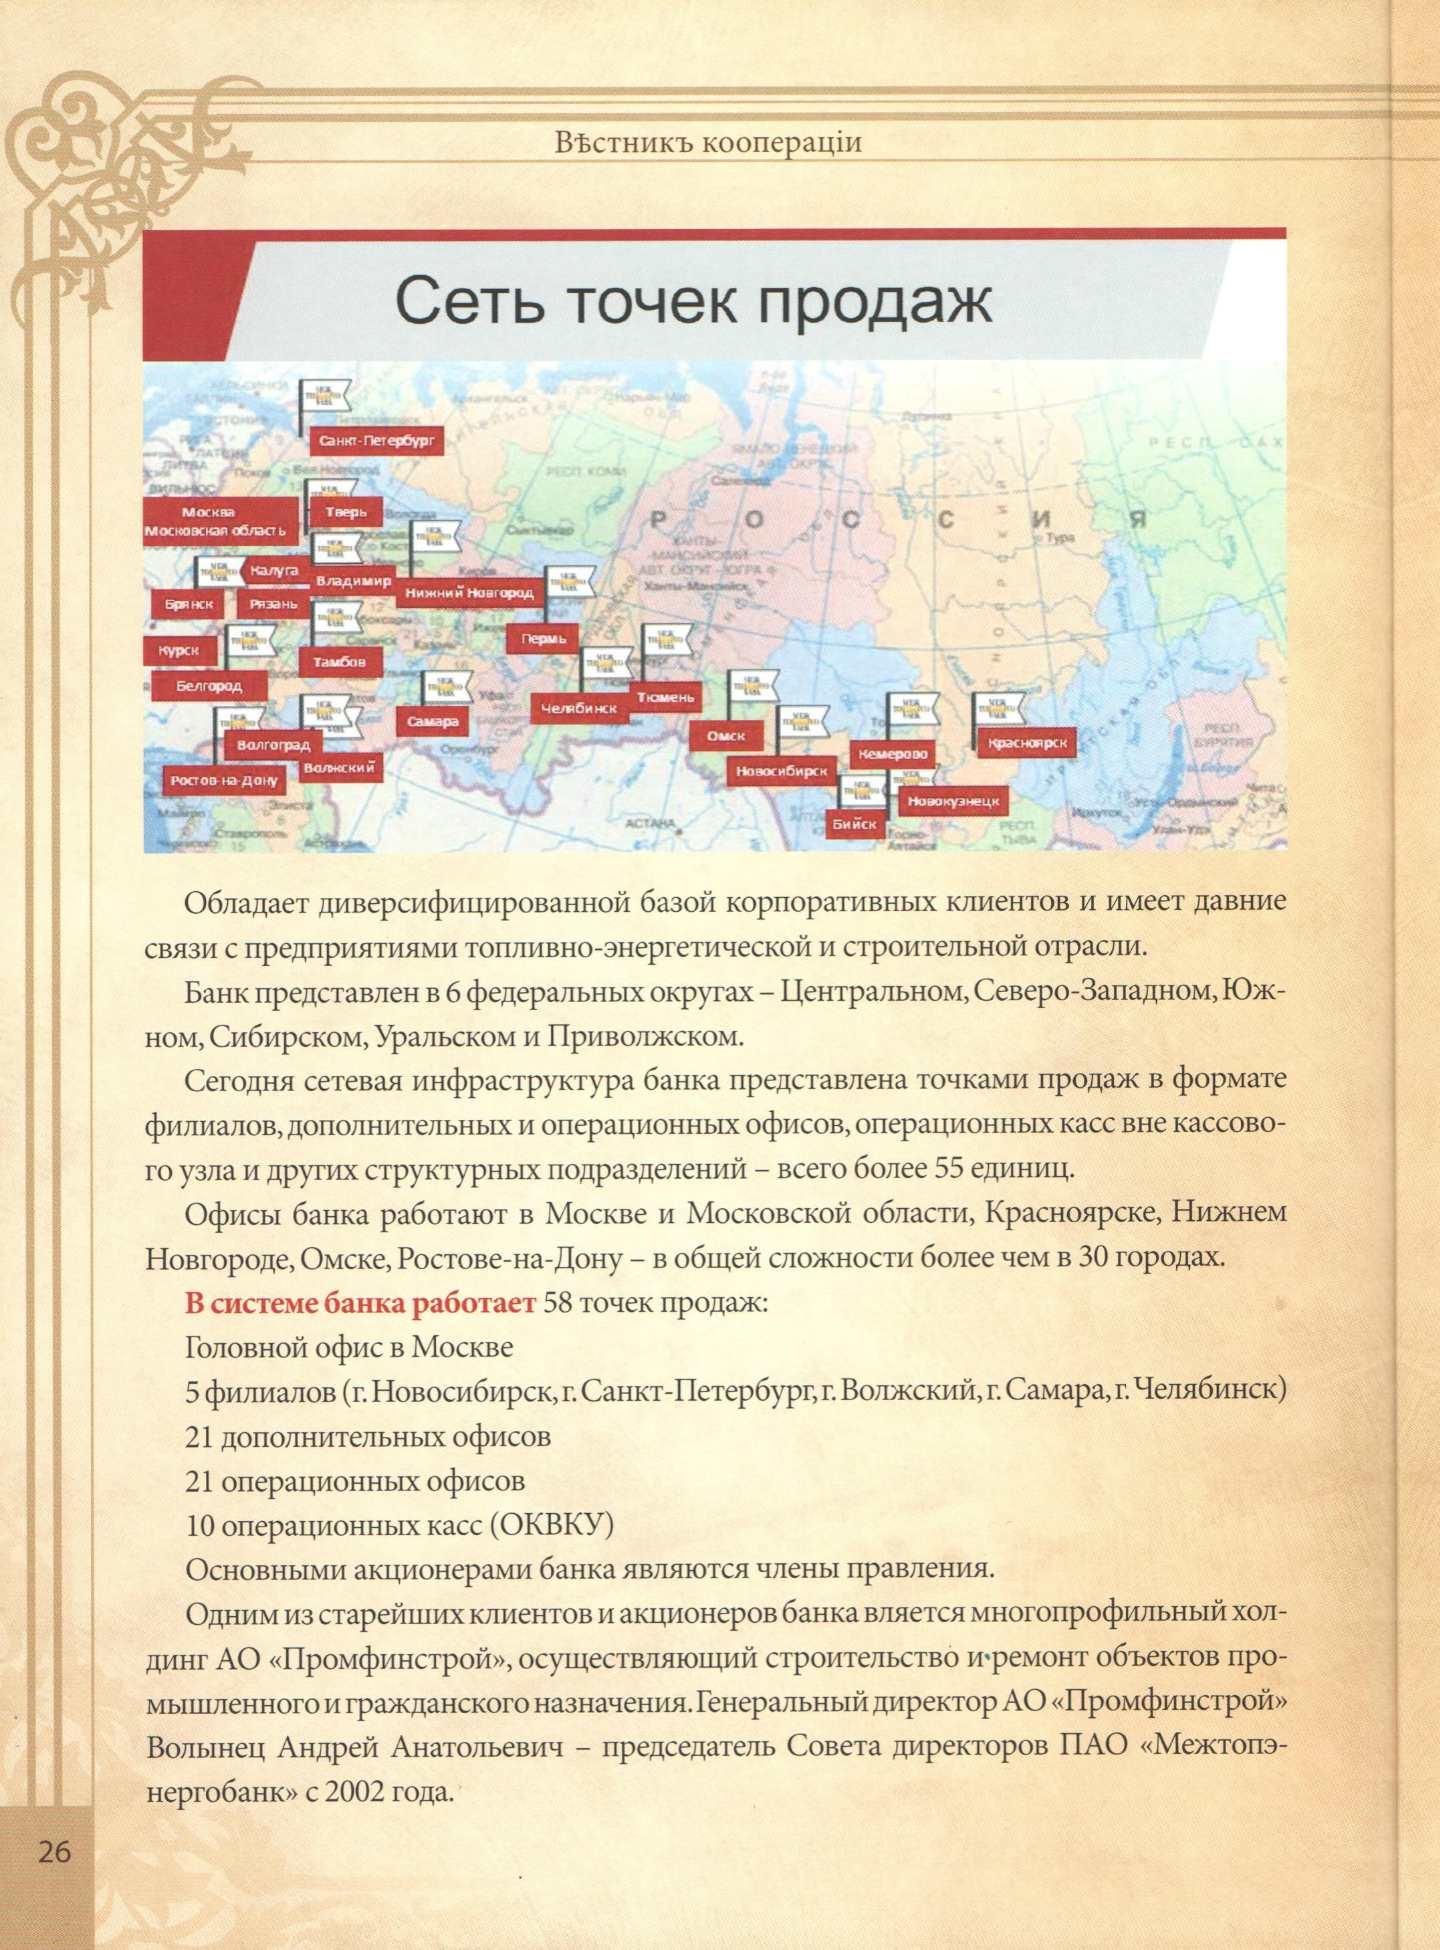 Вестник кооперации-26